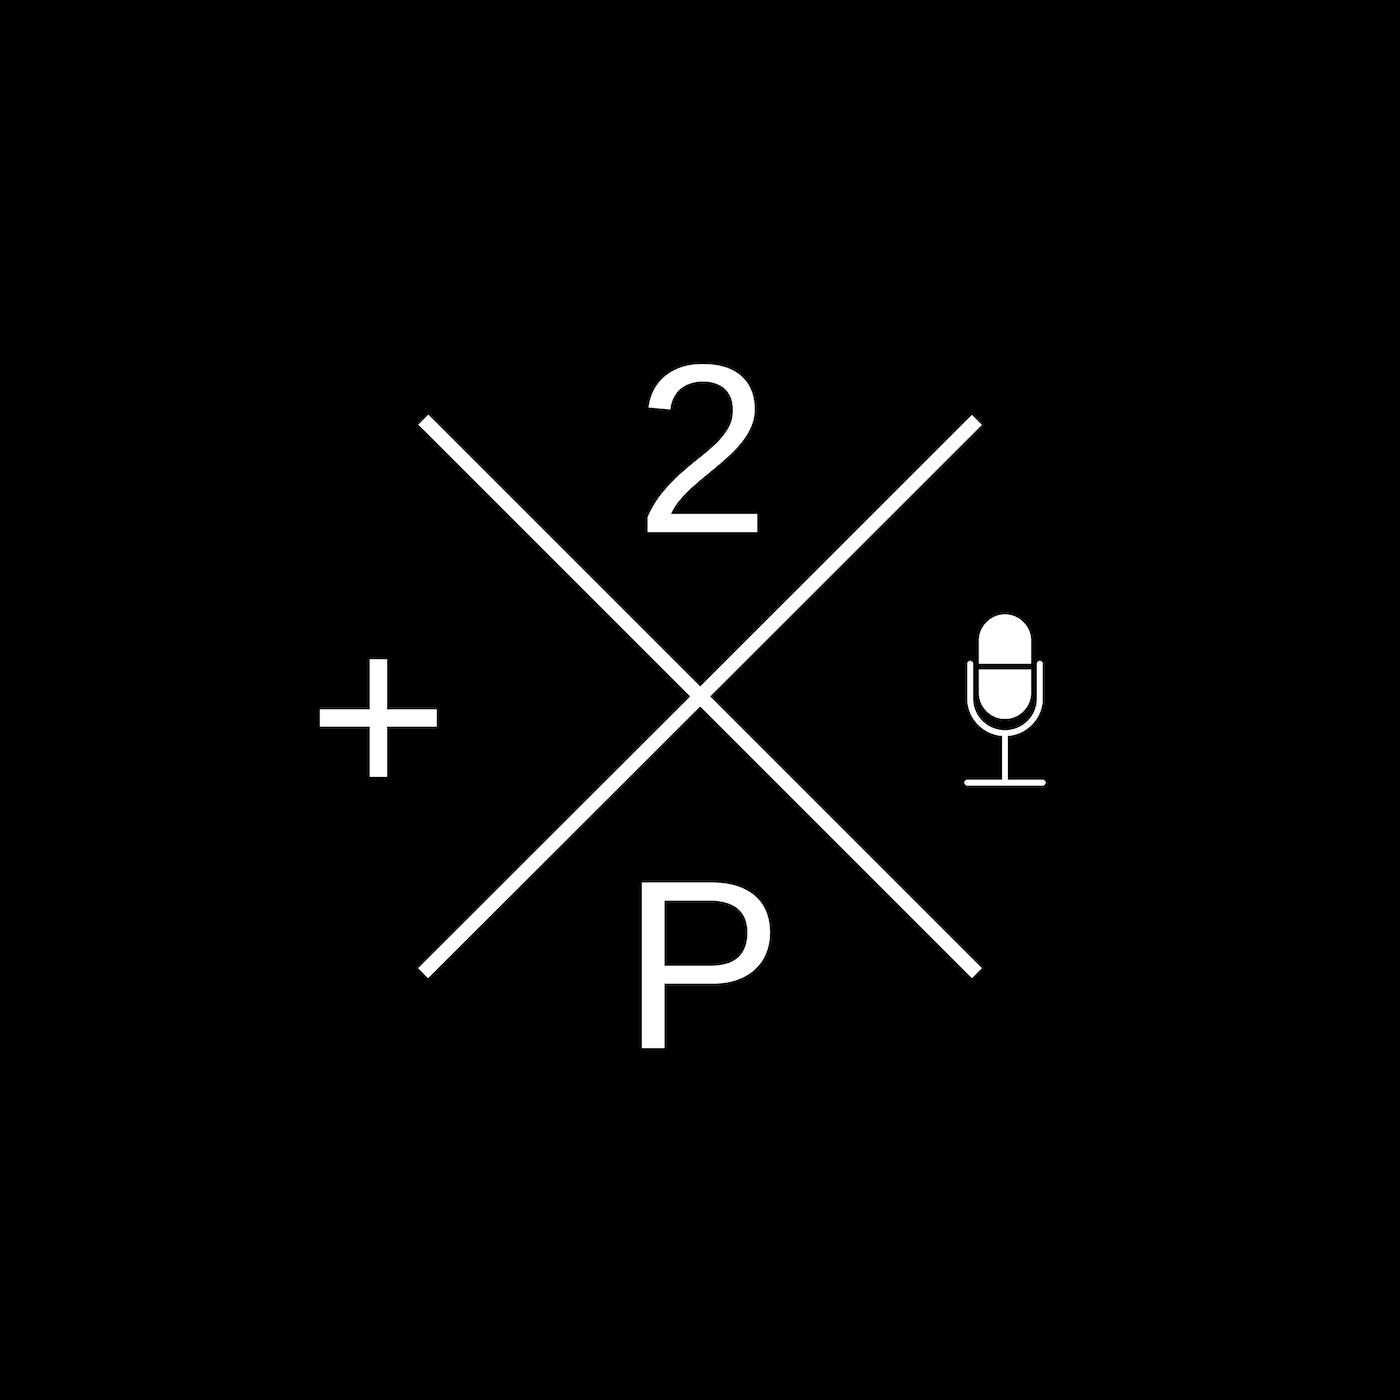 2 Pentecostals + a Microphone